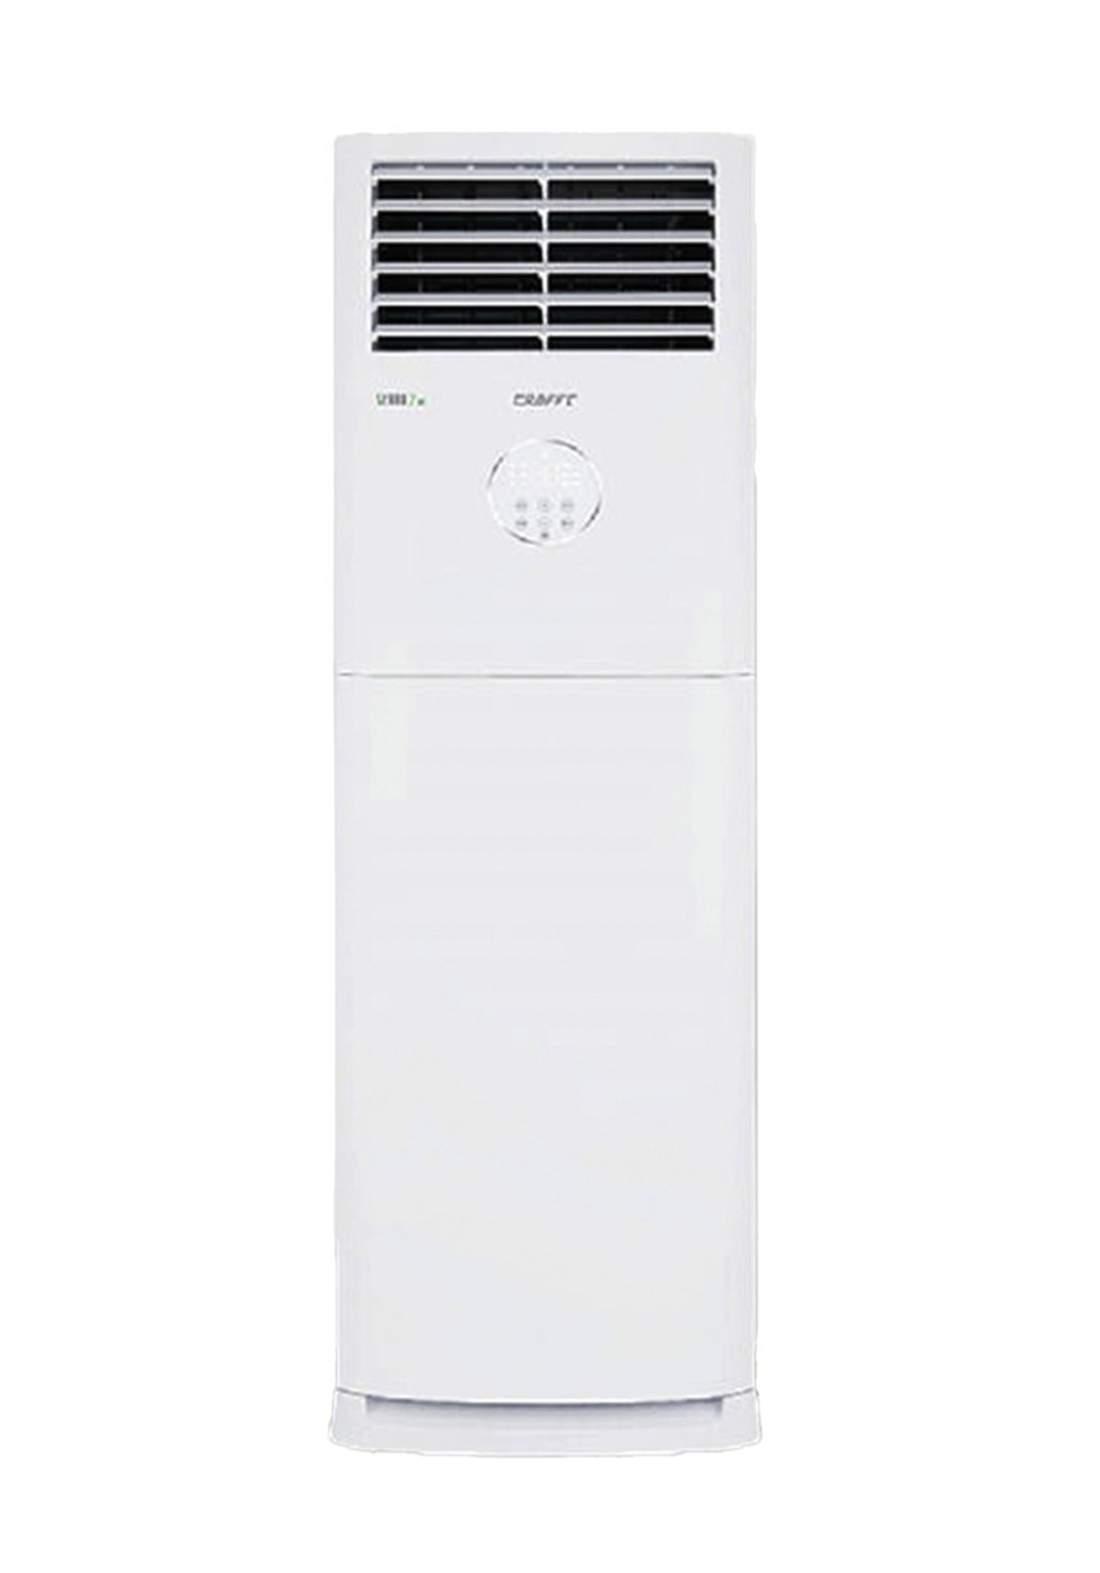 سبلت عامودي 3 طن حار بارد سيرا2 غاز  Crafft R410